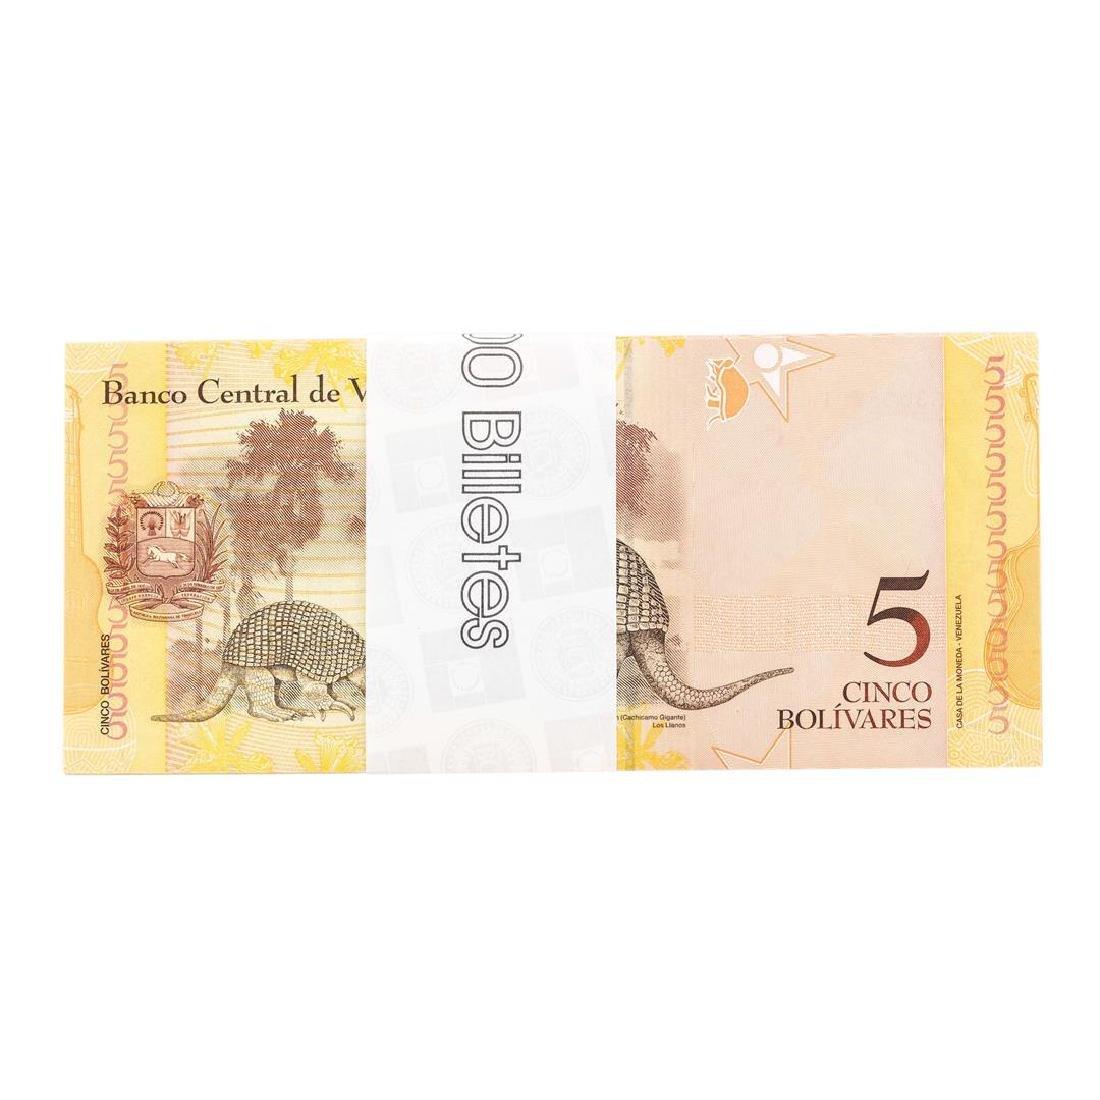 Pack of (100) Consecutive Venezuela 5 Bolivares - 2